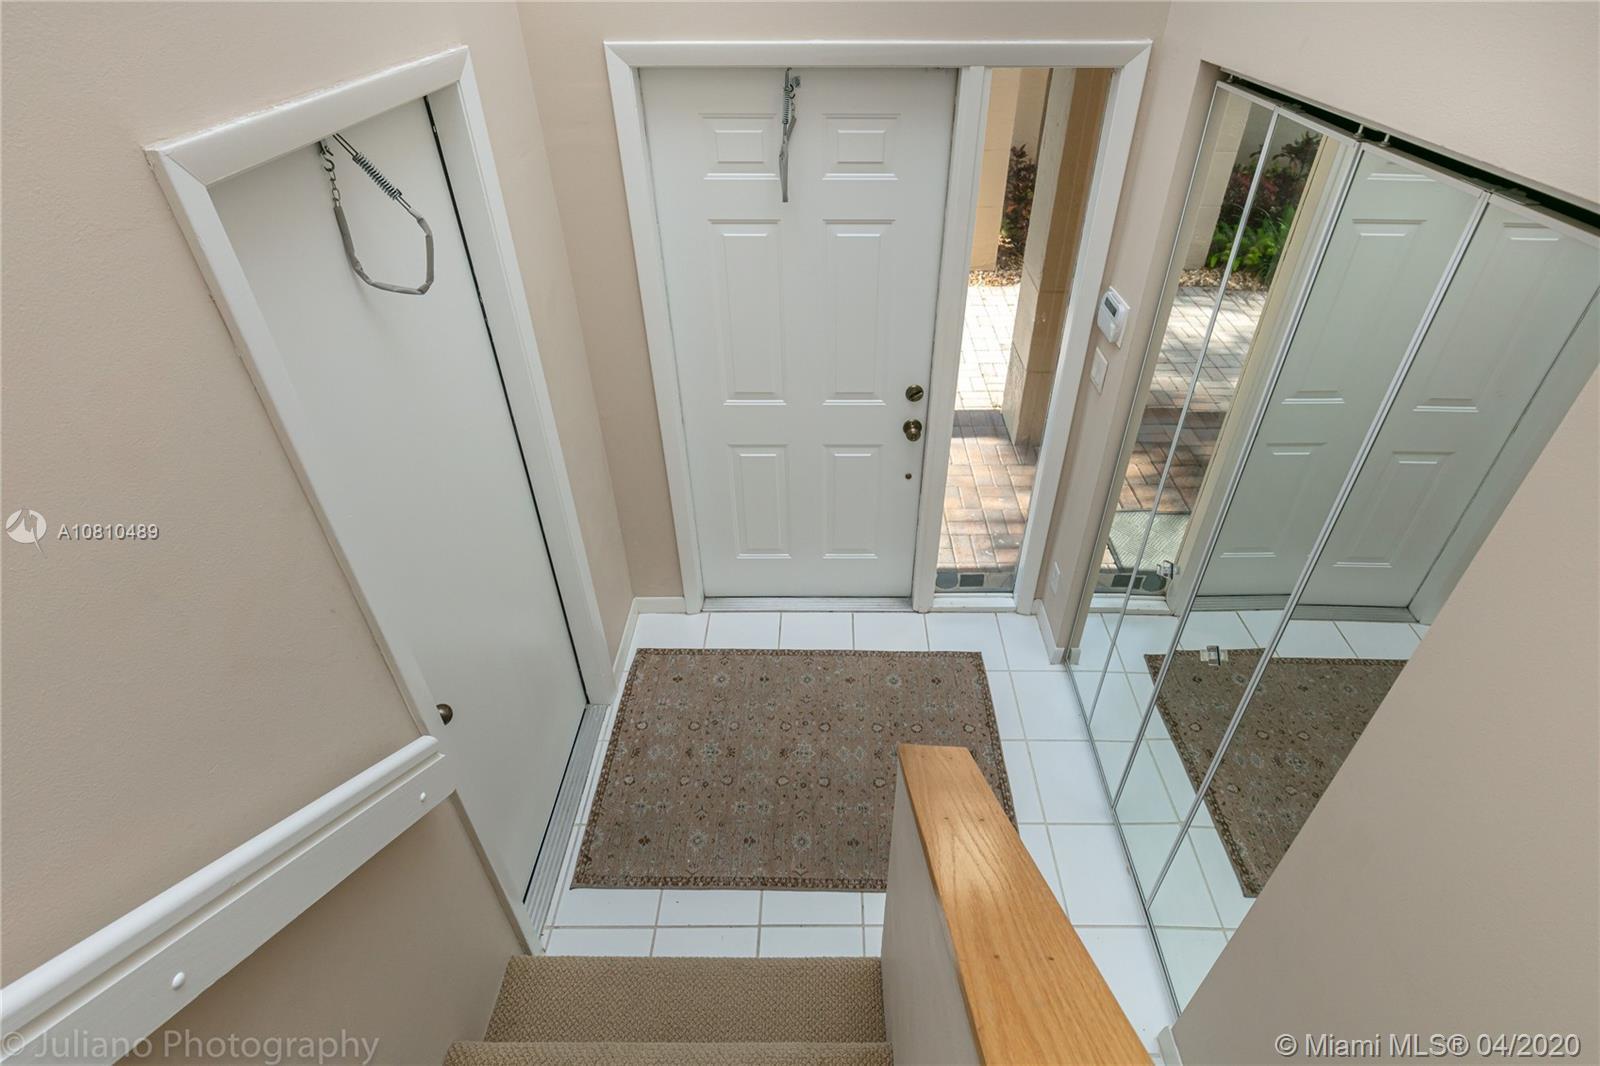 6730 Montego Bay Blvd #F, Boca Raton, FL 33433 - Boca Raton, FL real estate listing